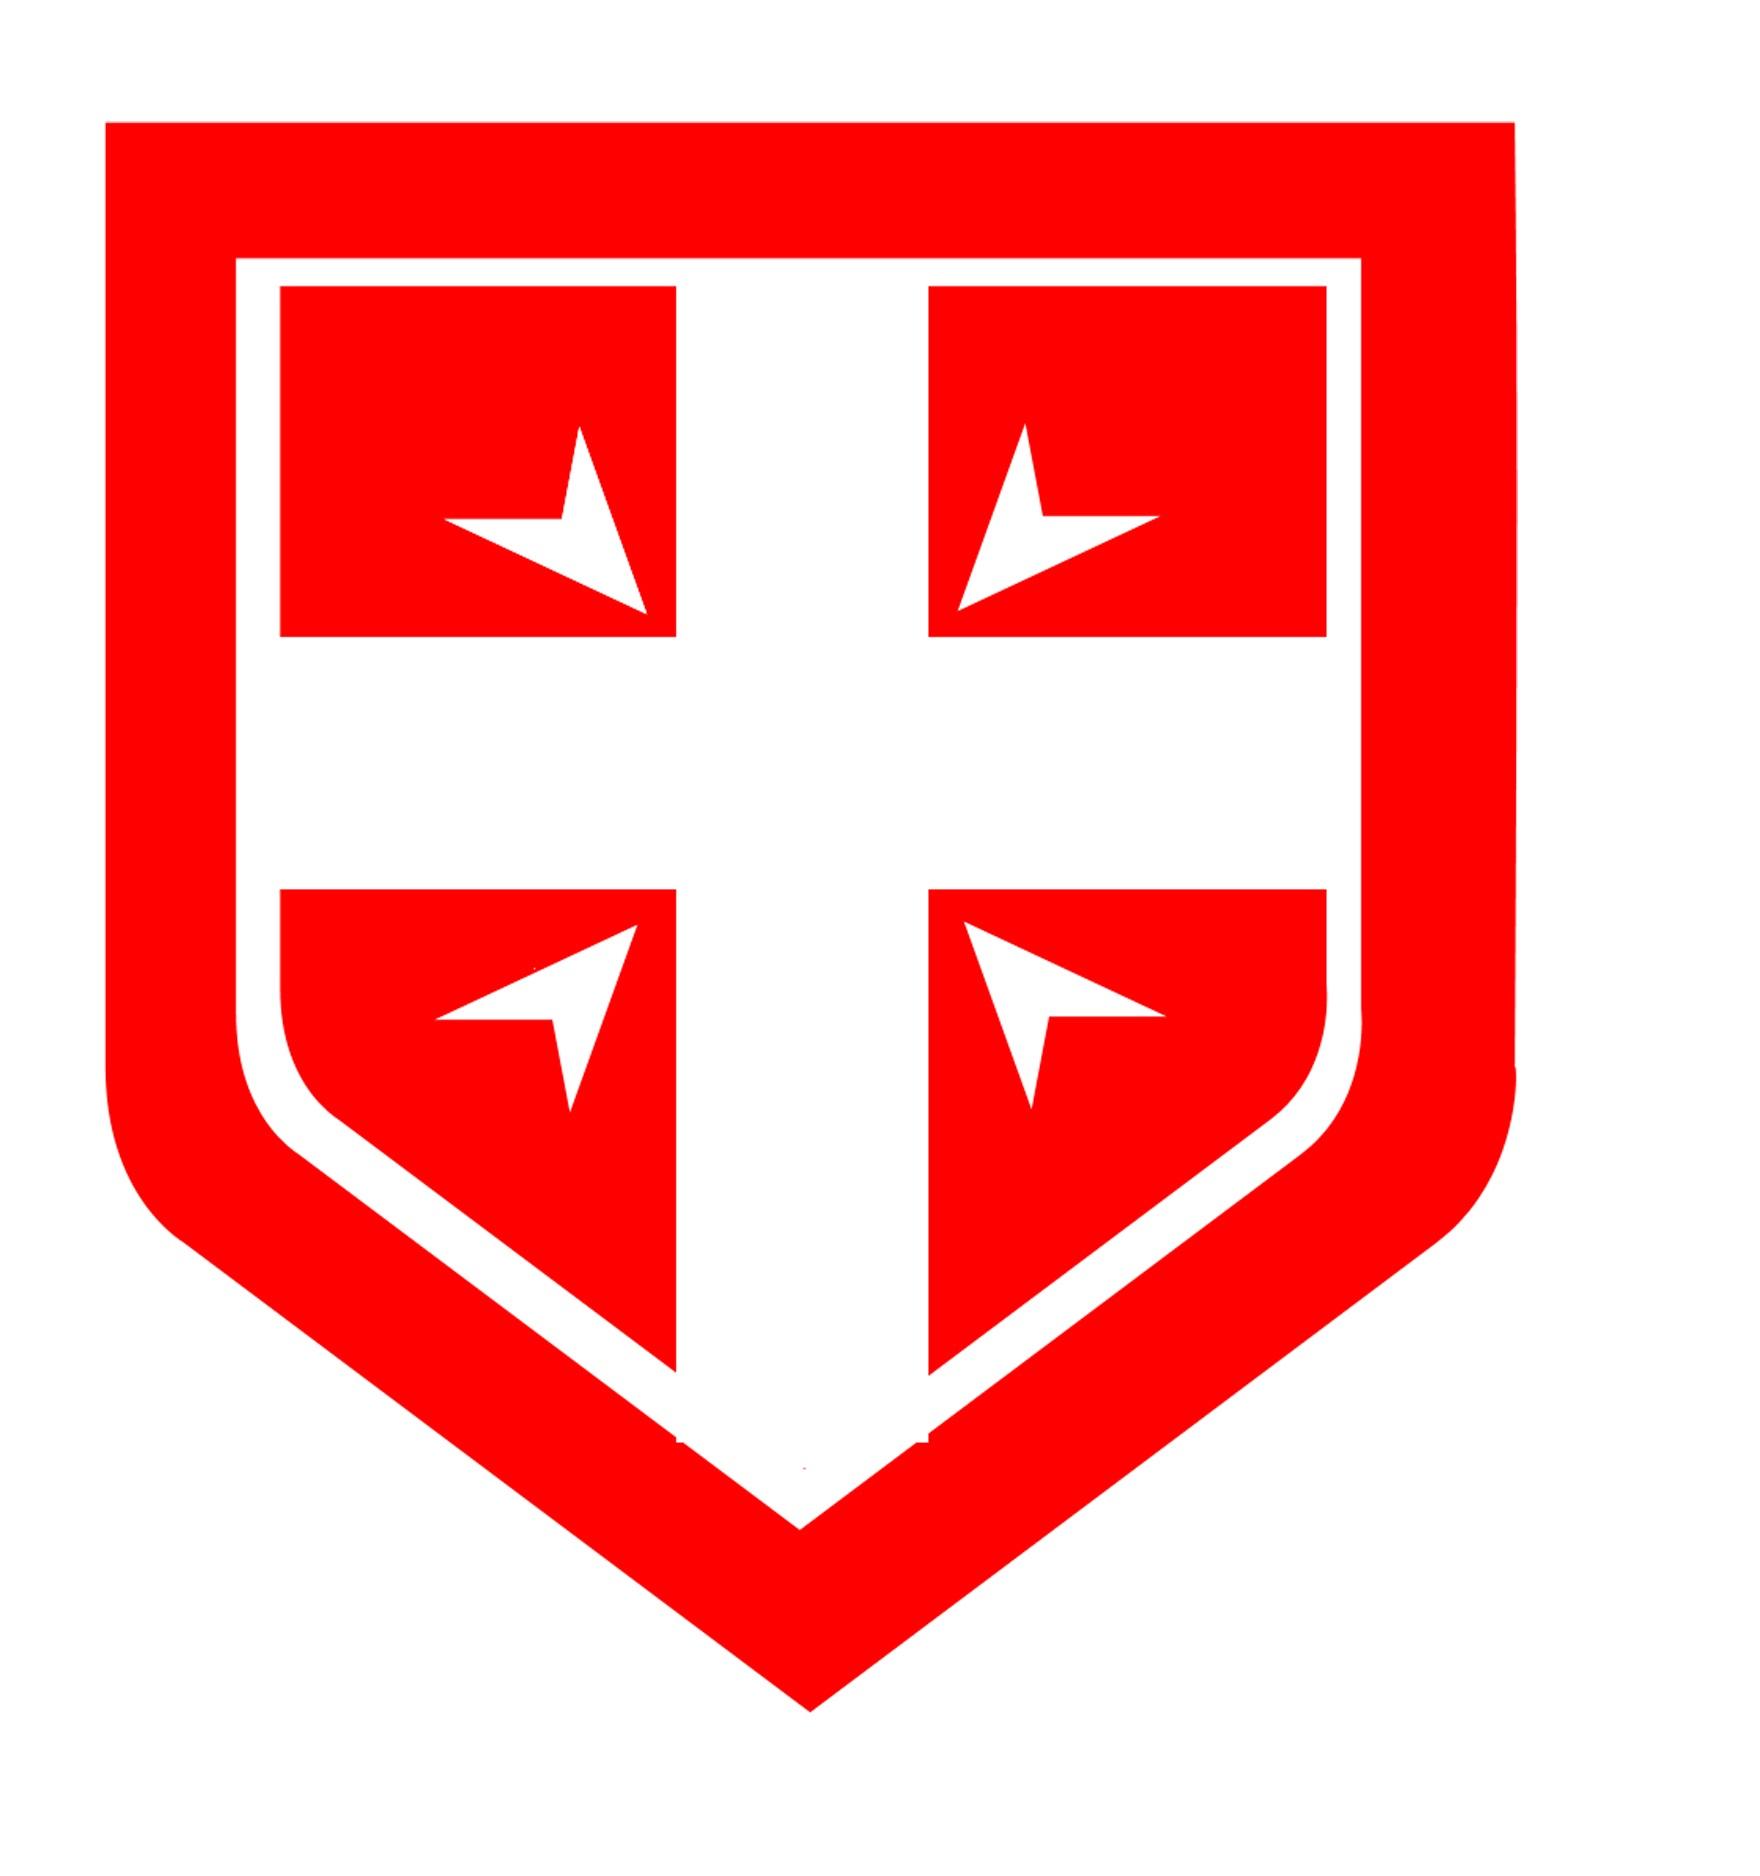 St Alban's CE Primary